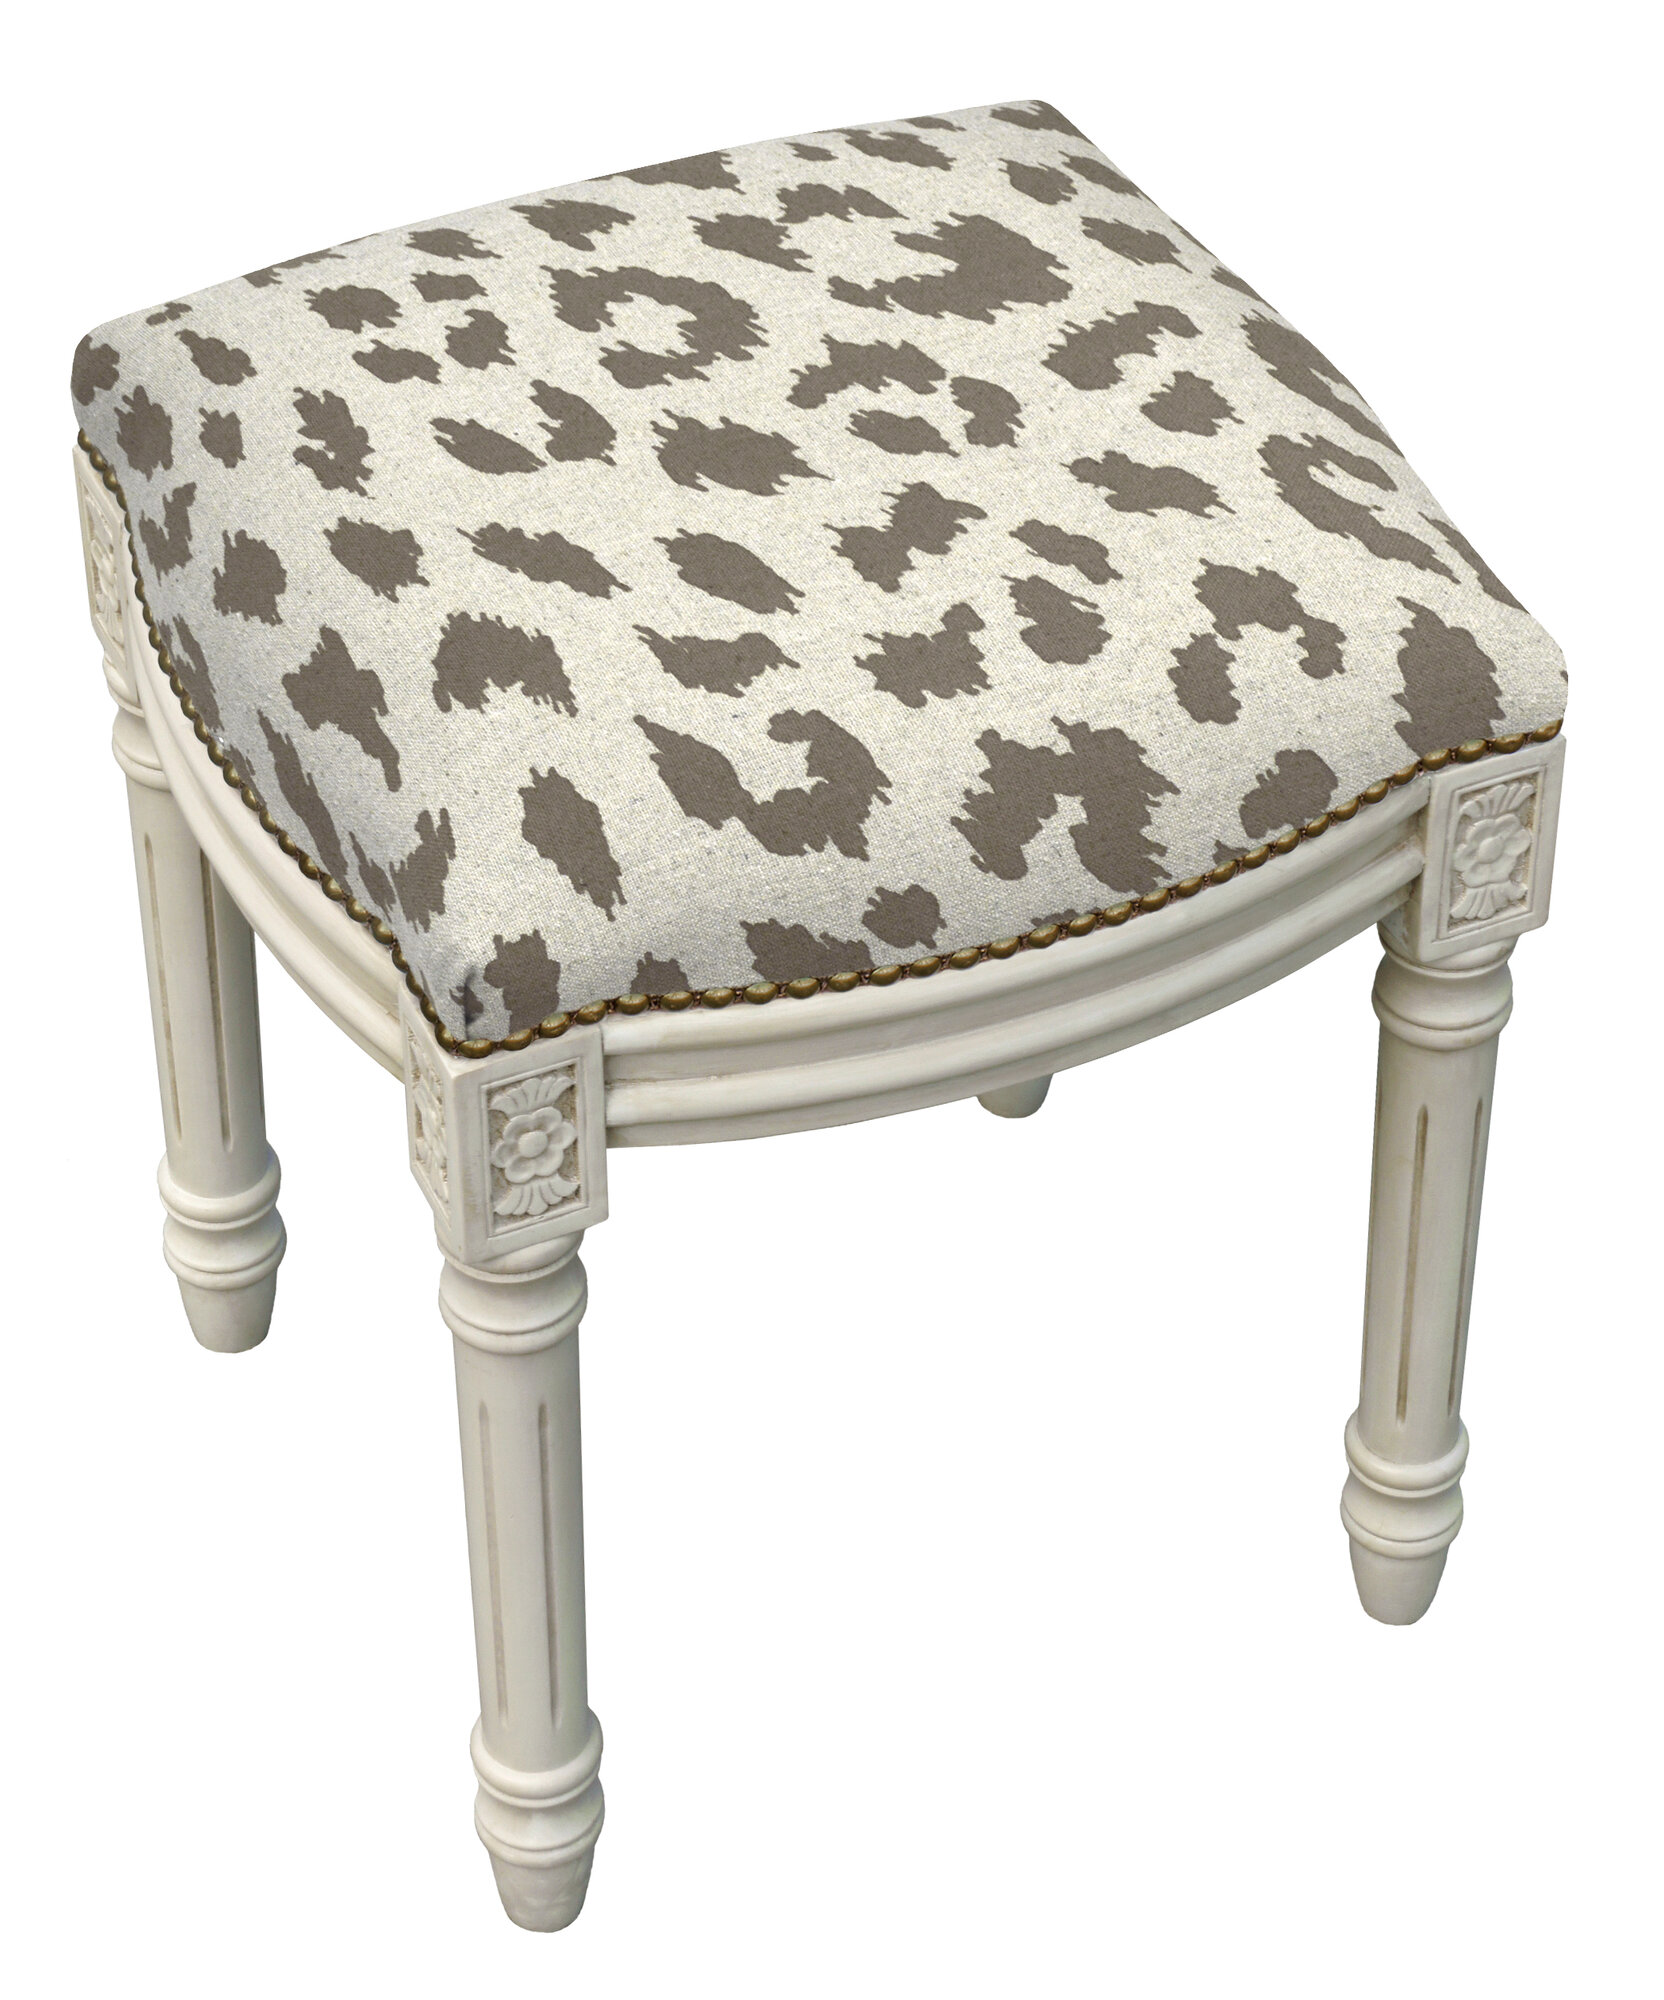 123 Creations Animal Print Cheetah Linen Upholstered